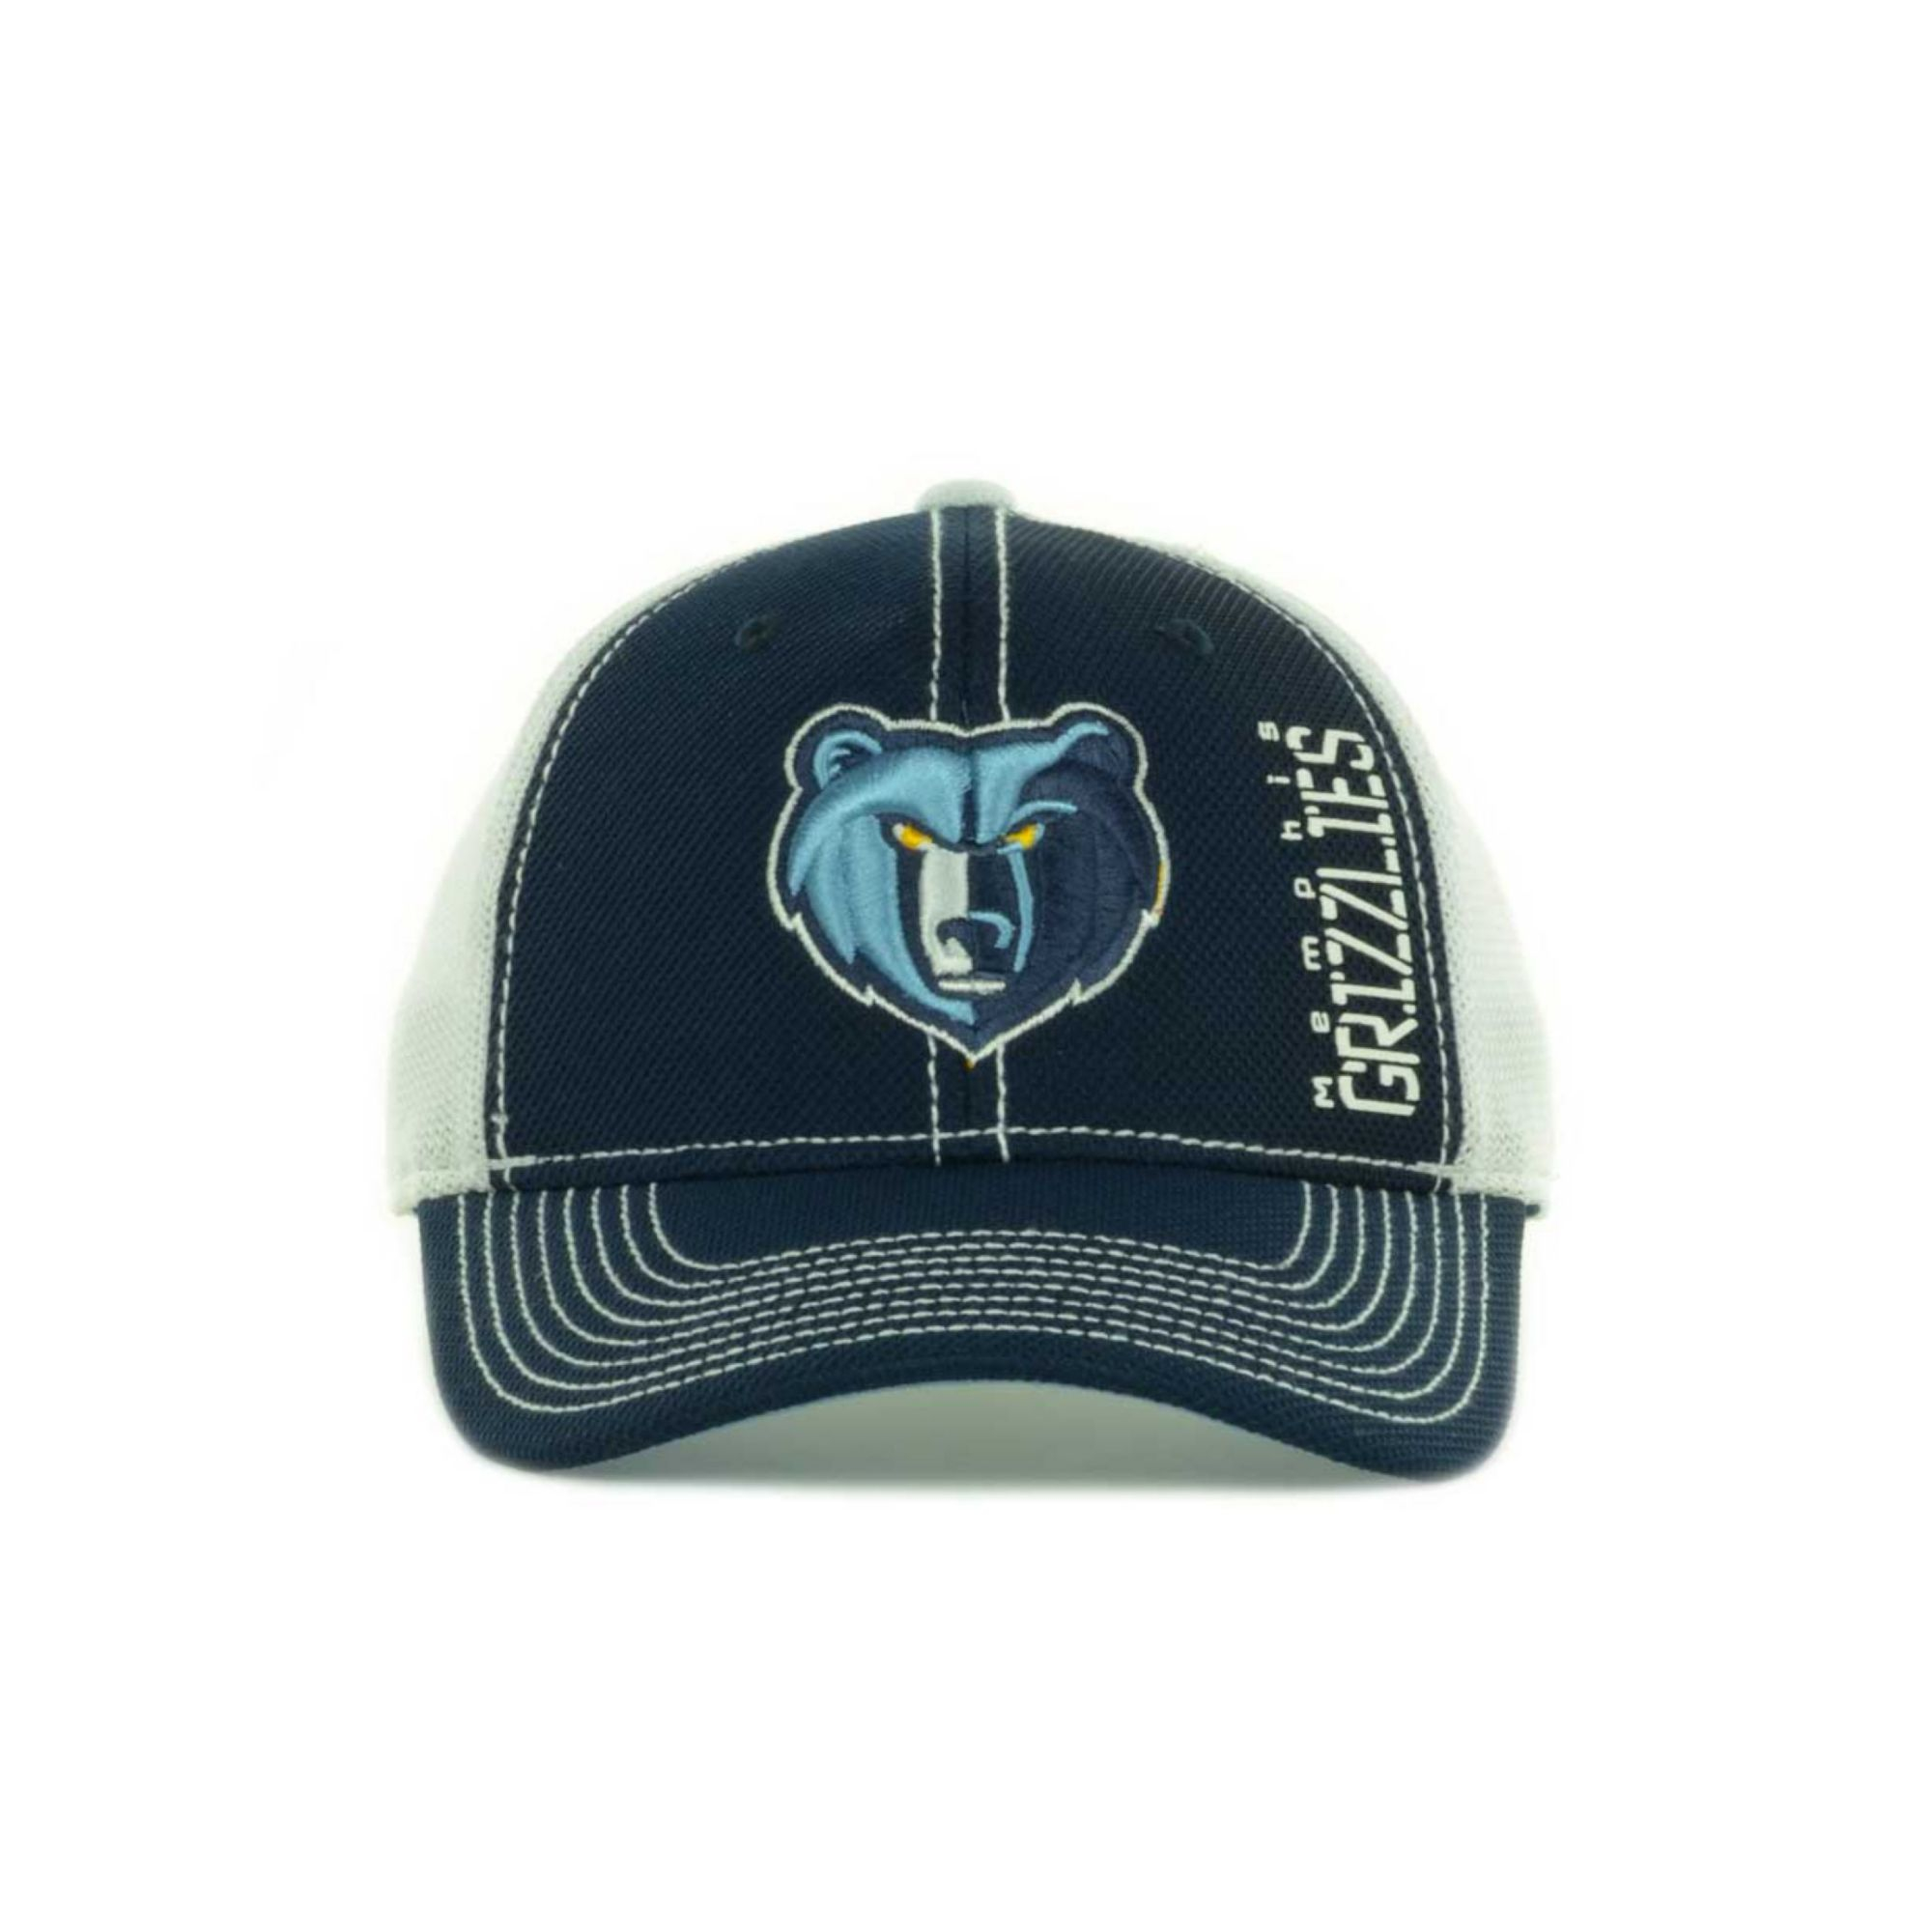 sports shoes eda25 61d3c Lyst - Adidas Memphis Grizzlies Nba Zone Mesh Cap in Blue for Men